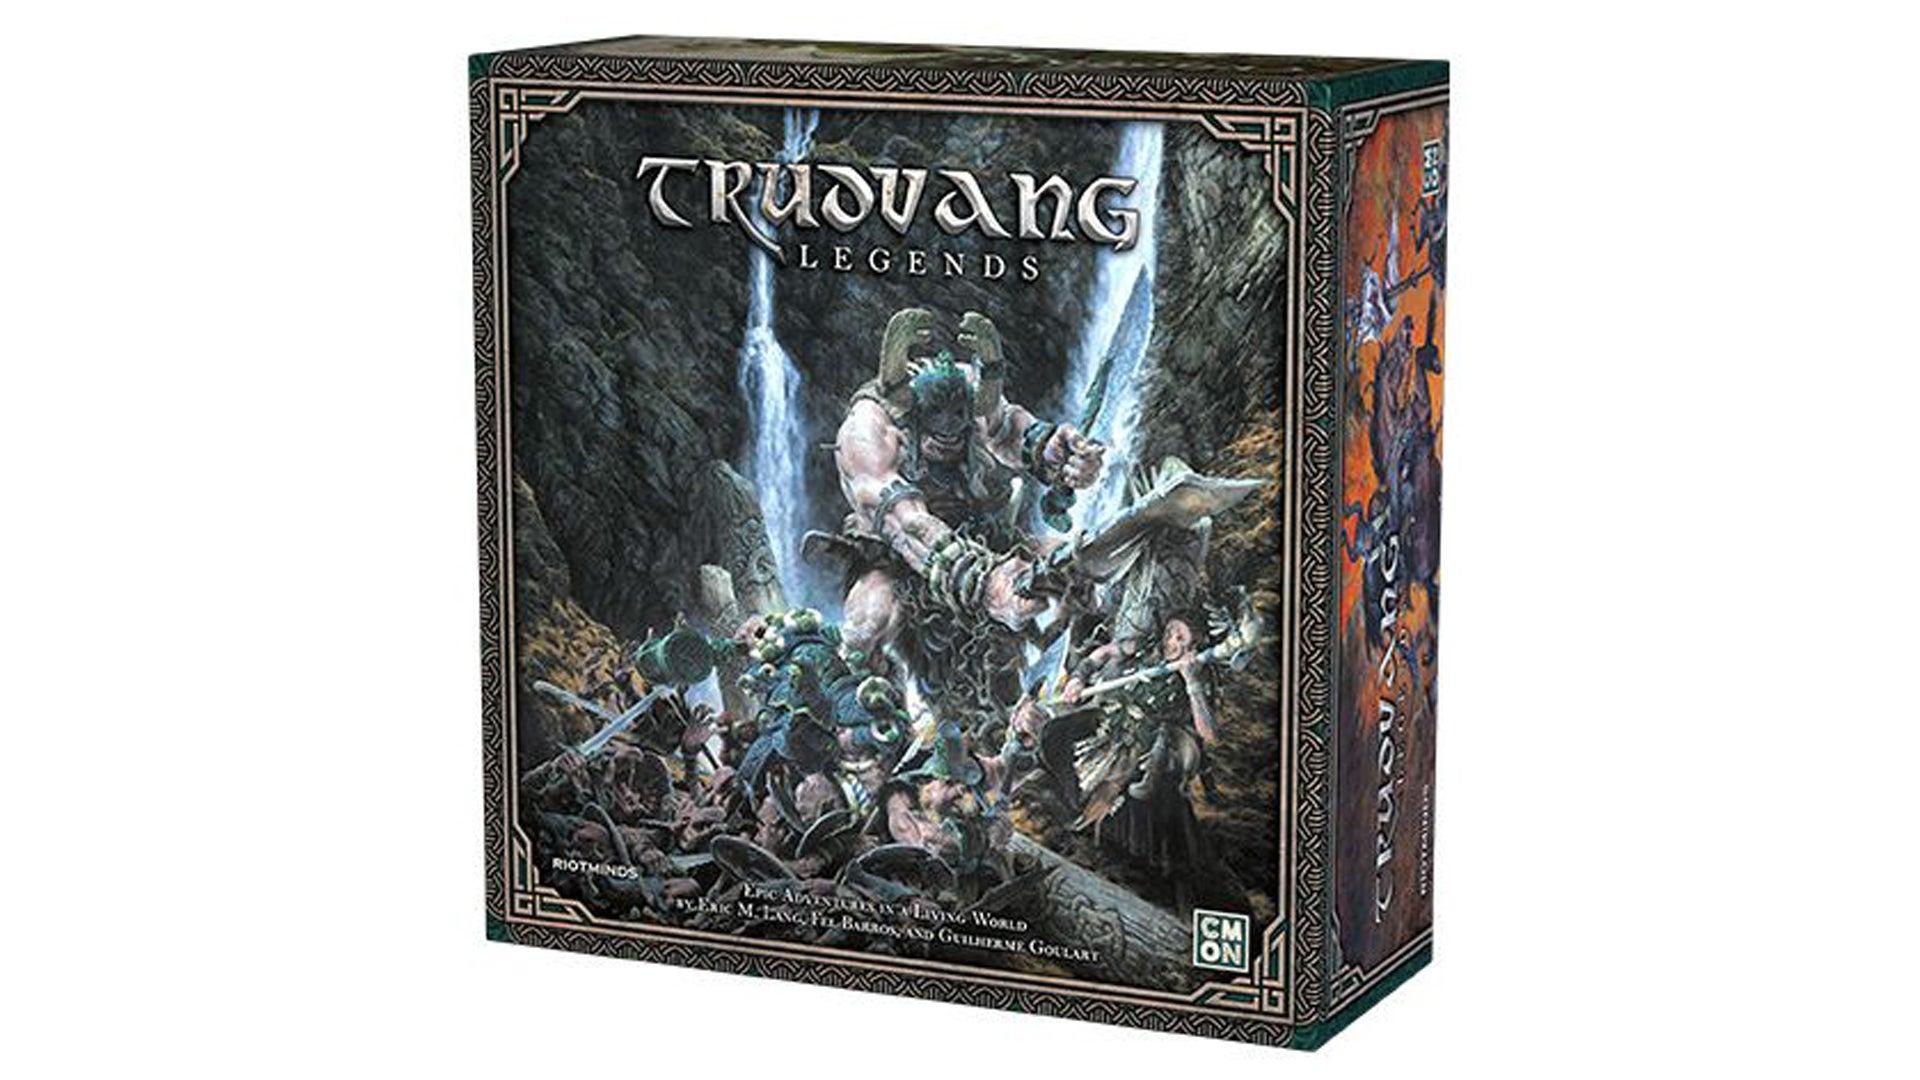 Trudvang Legends board game box